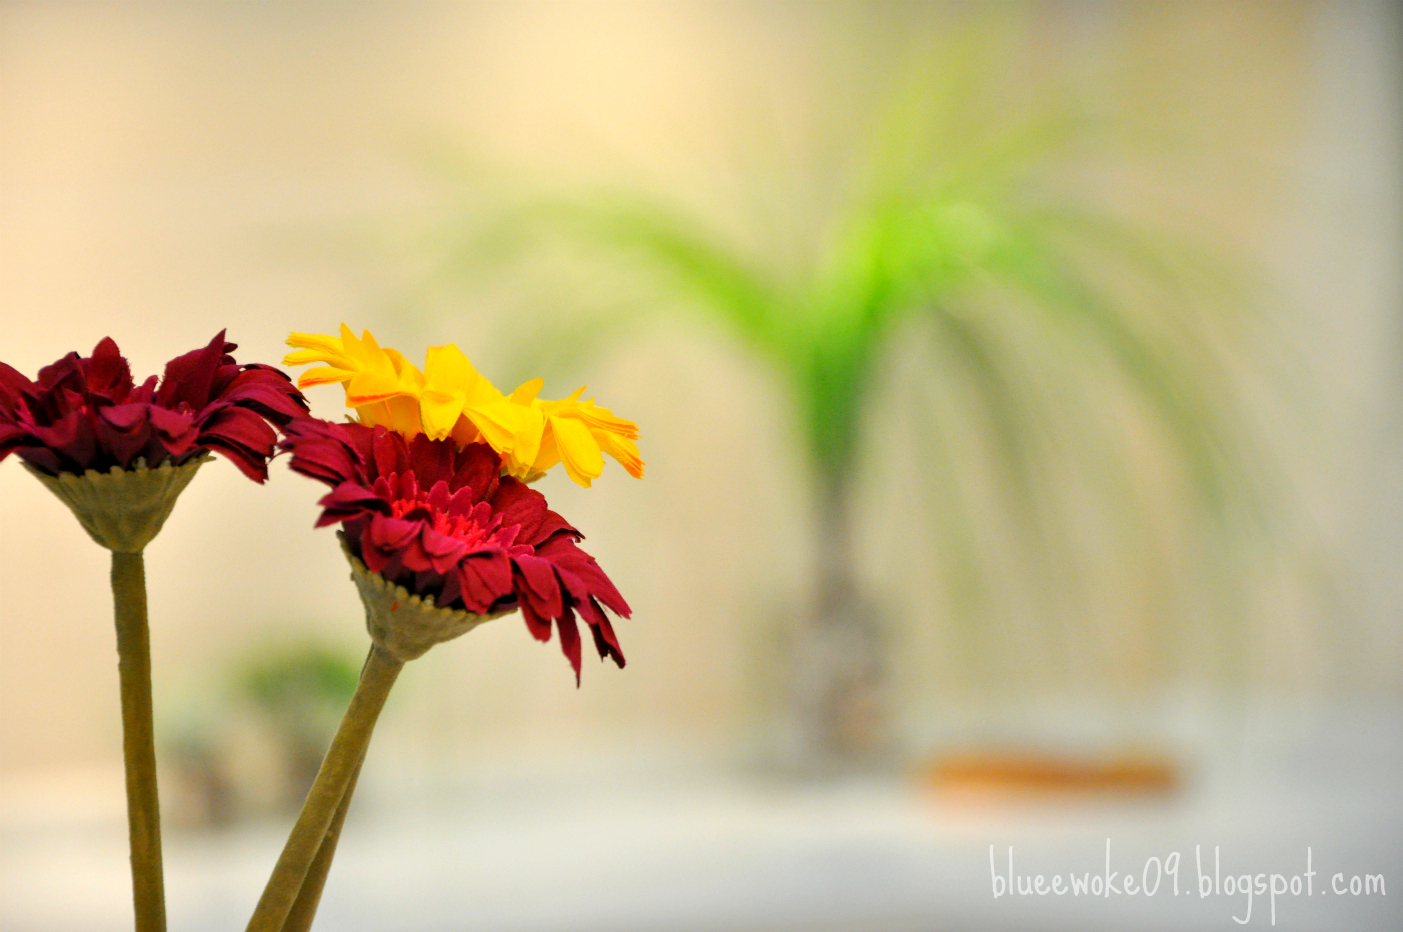 Artificial flowers yang didatangkan khas dari Ikea. Murahmurah saja